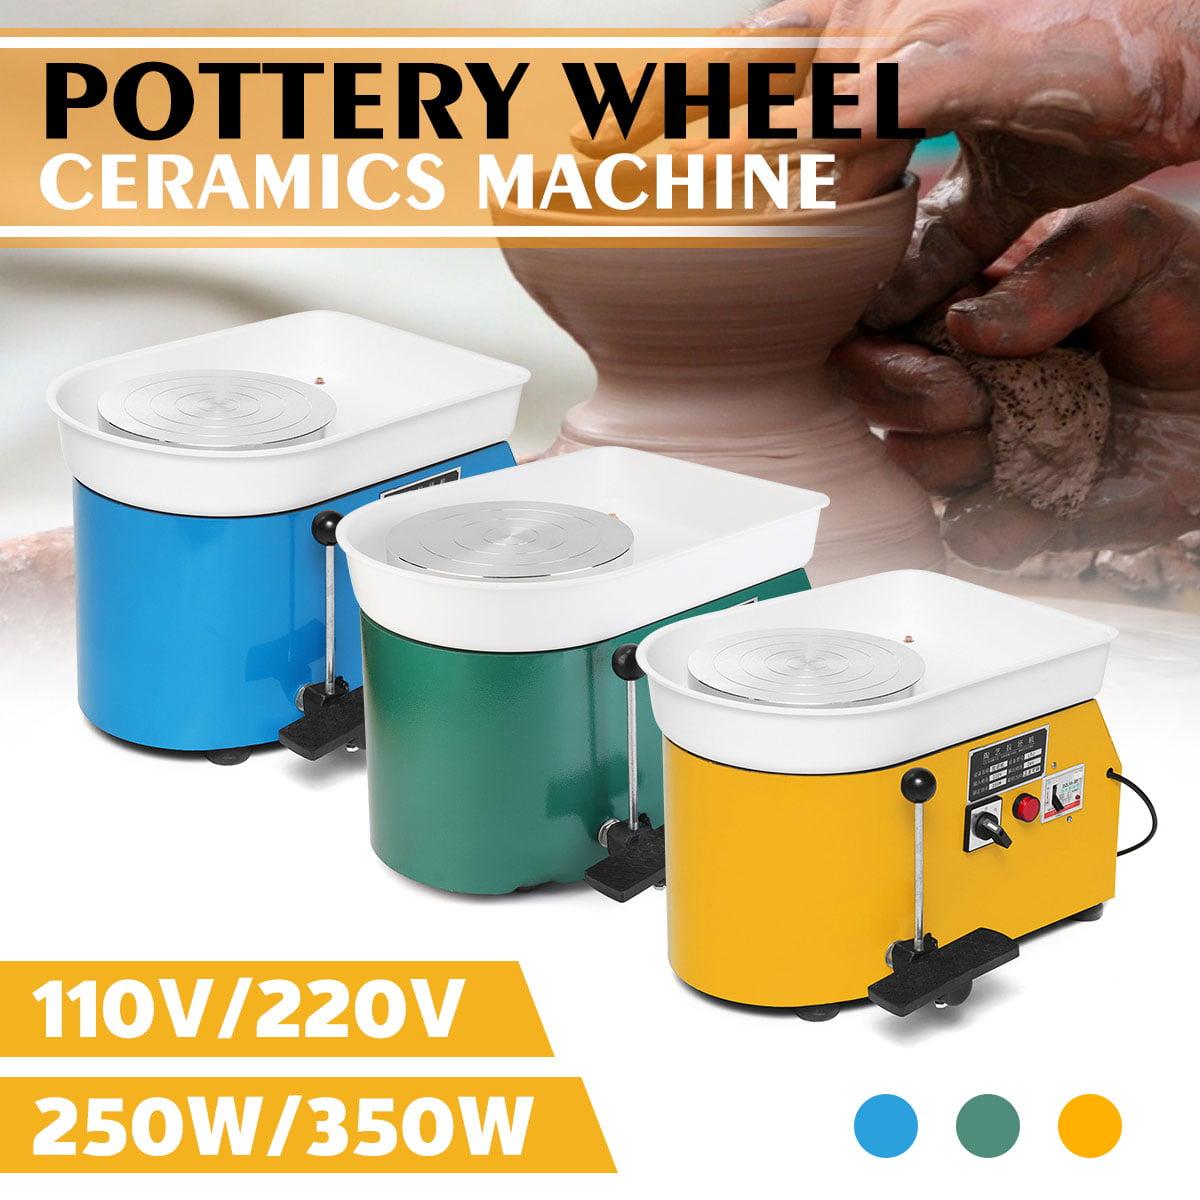 110V Electric Pottery Wheel Machine Ceramic Work Clay Art Craft DIY 250W